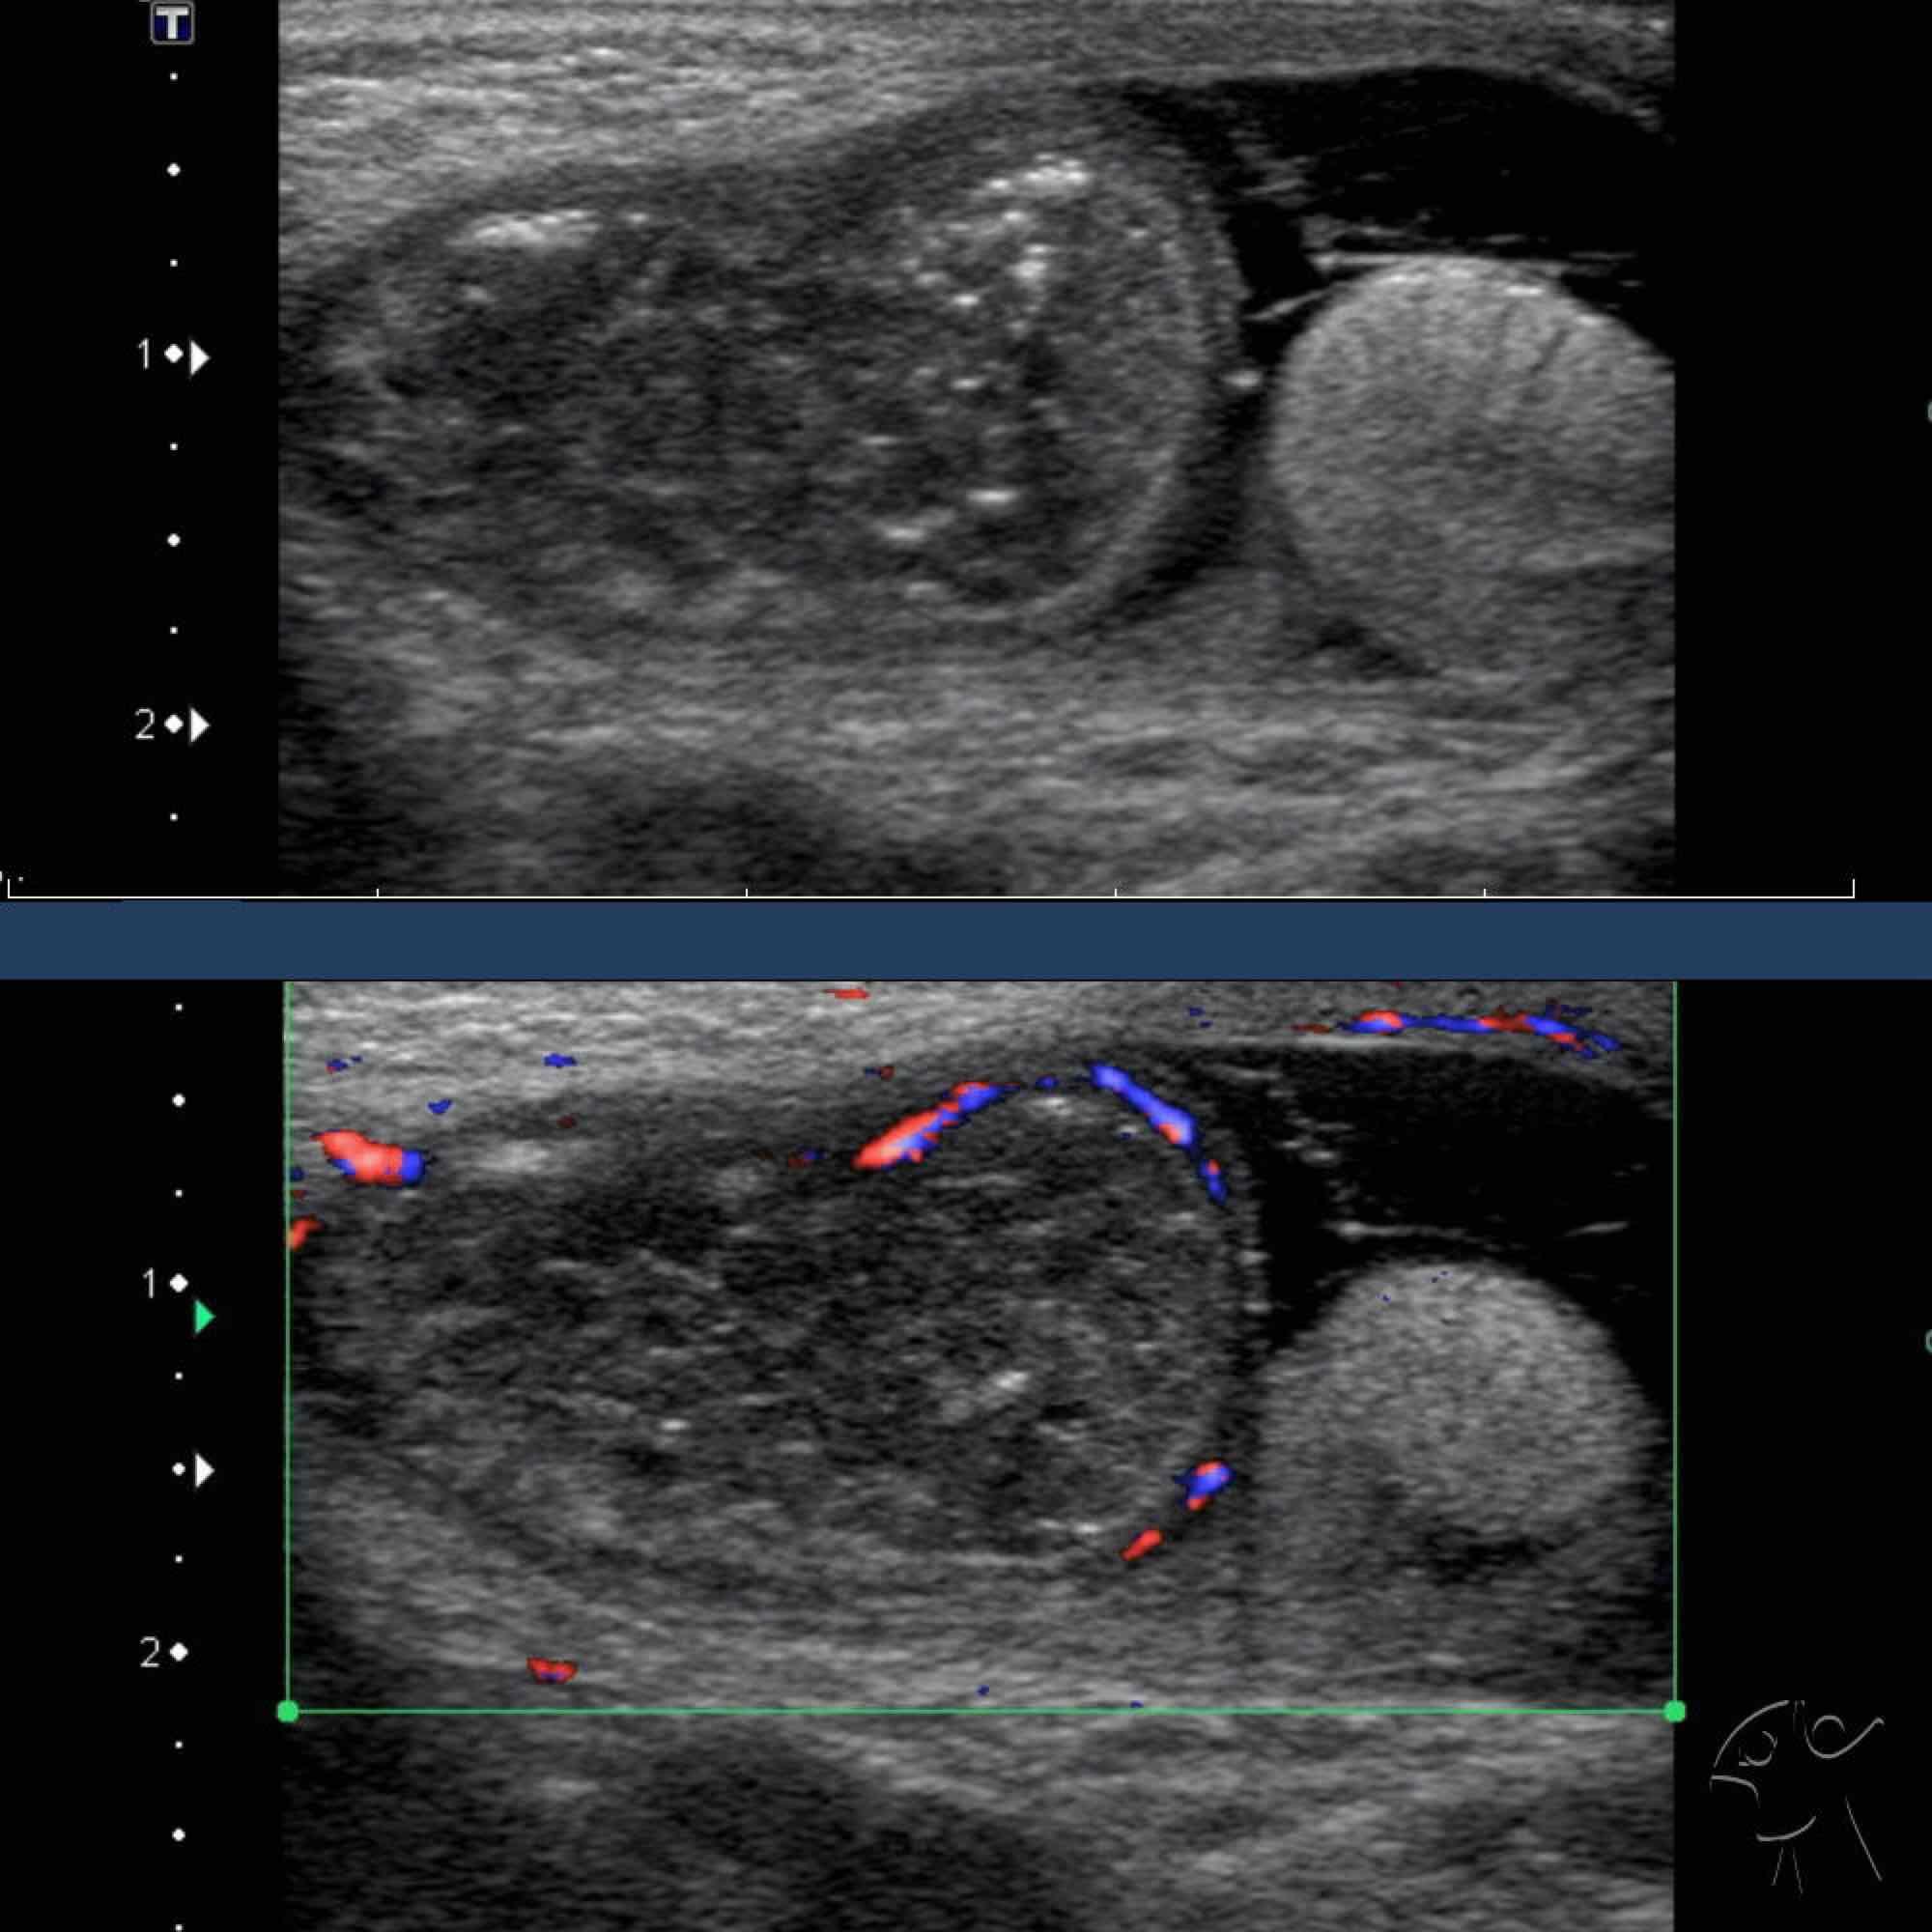 Ultrasound Inguinal Hernia Into Scrotum Causing Testicular